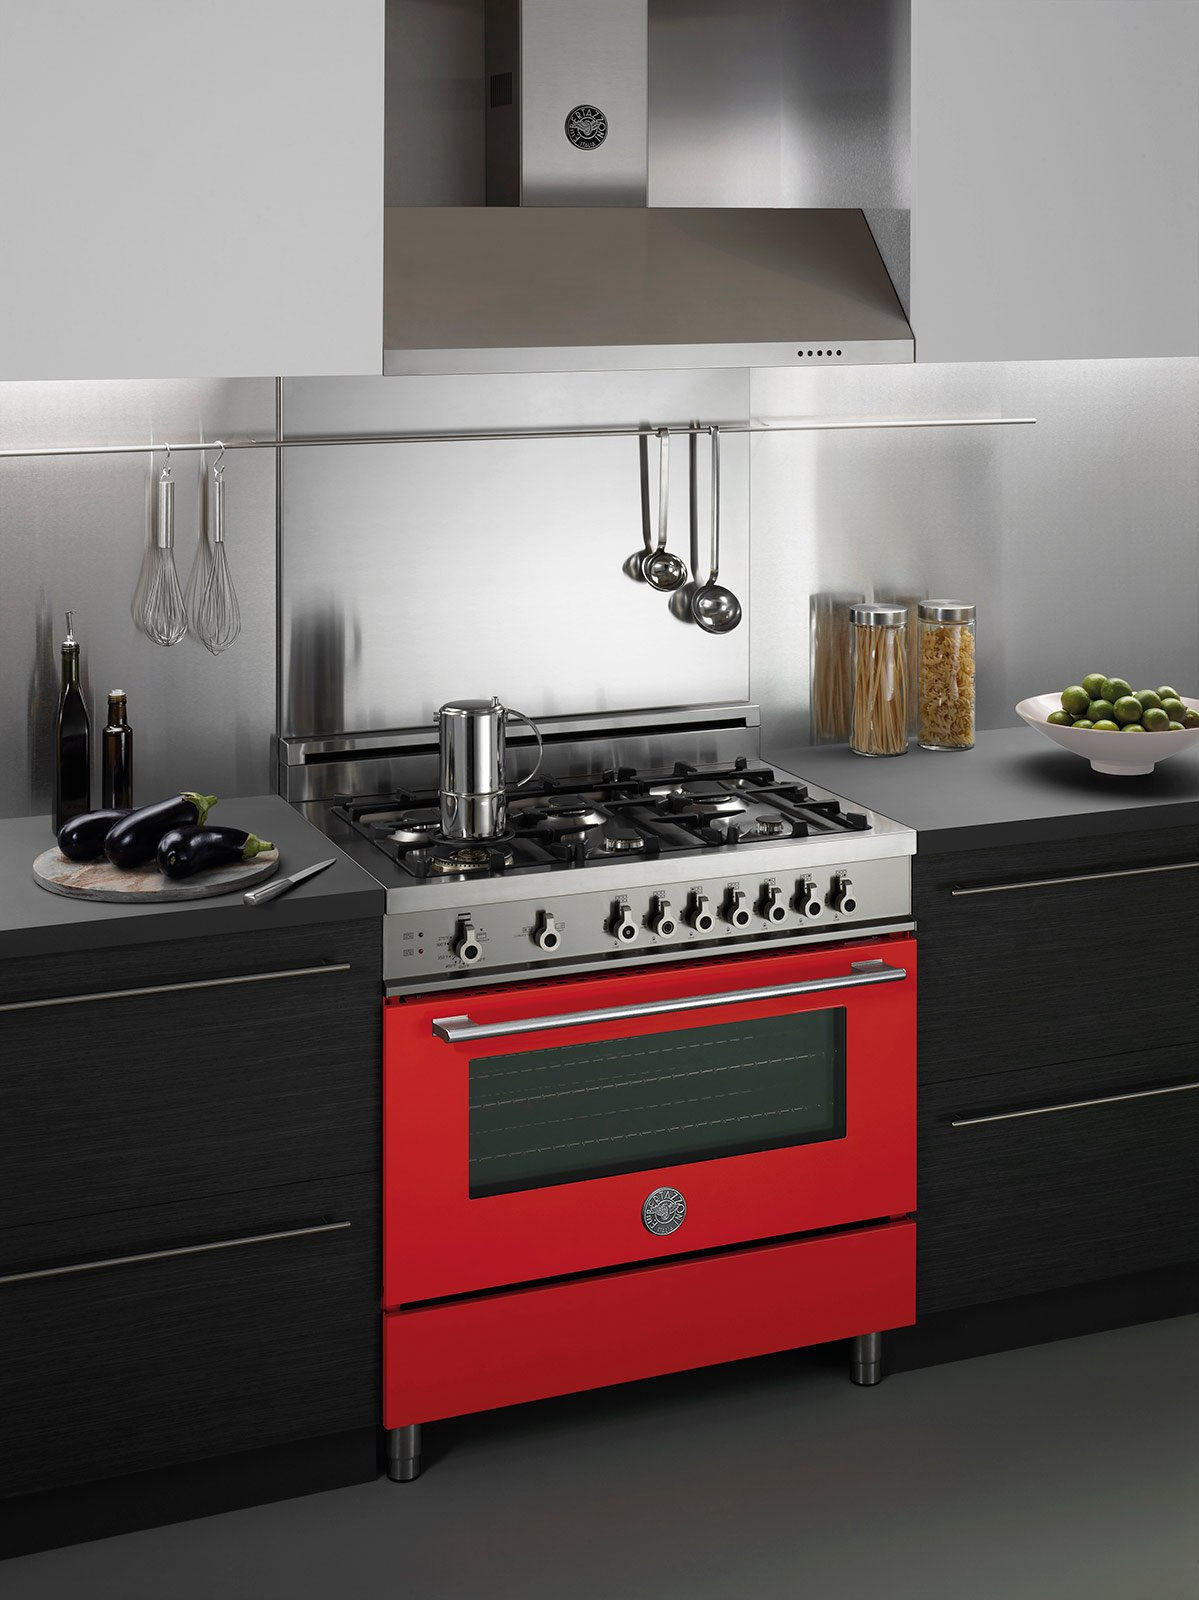 Cucina Scavolini Tess Forum : Cucina ad angolo cad. Cucina a legna ...